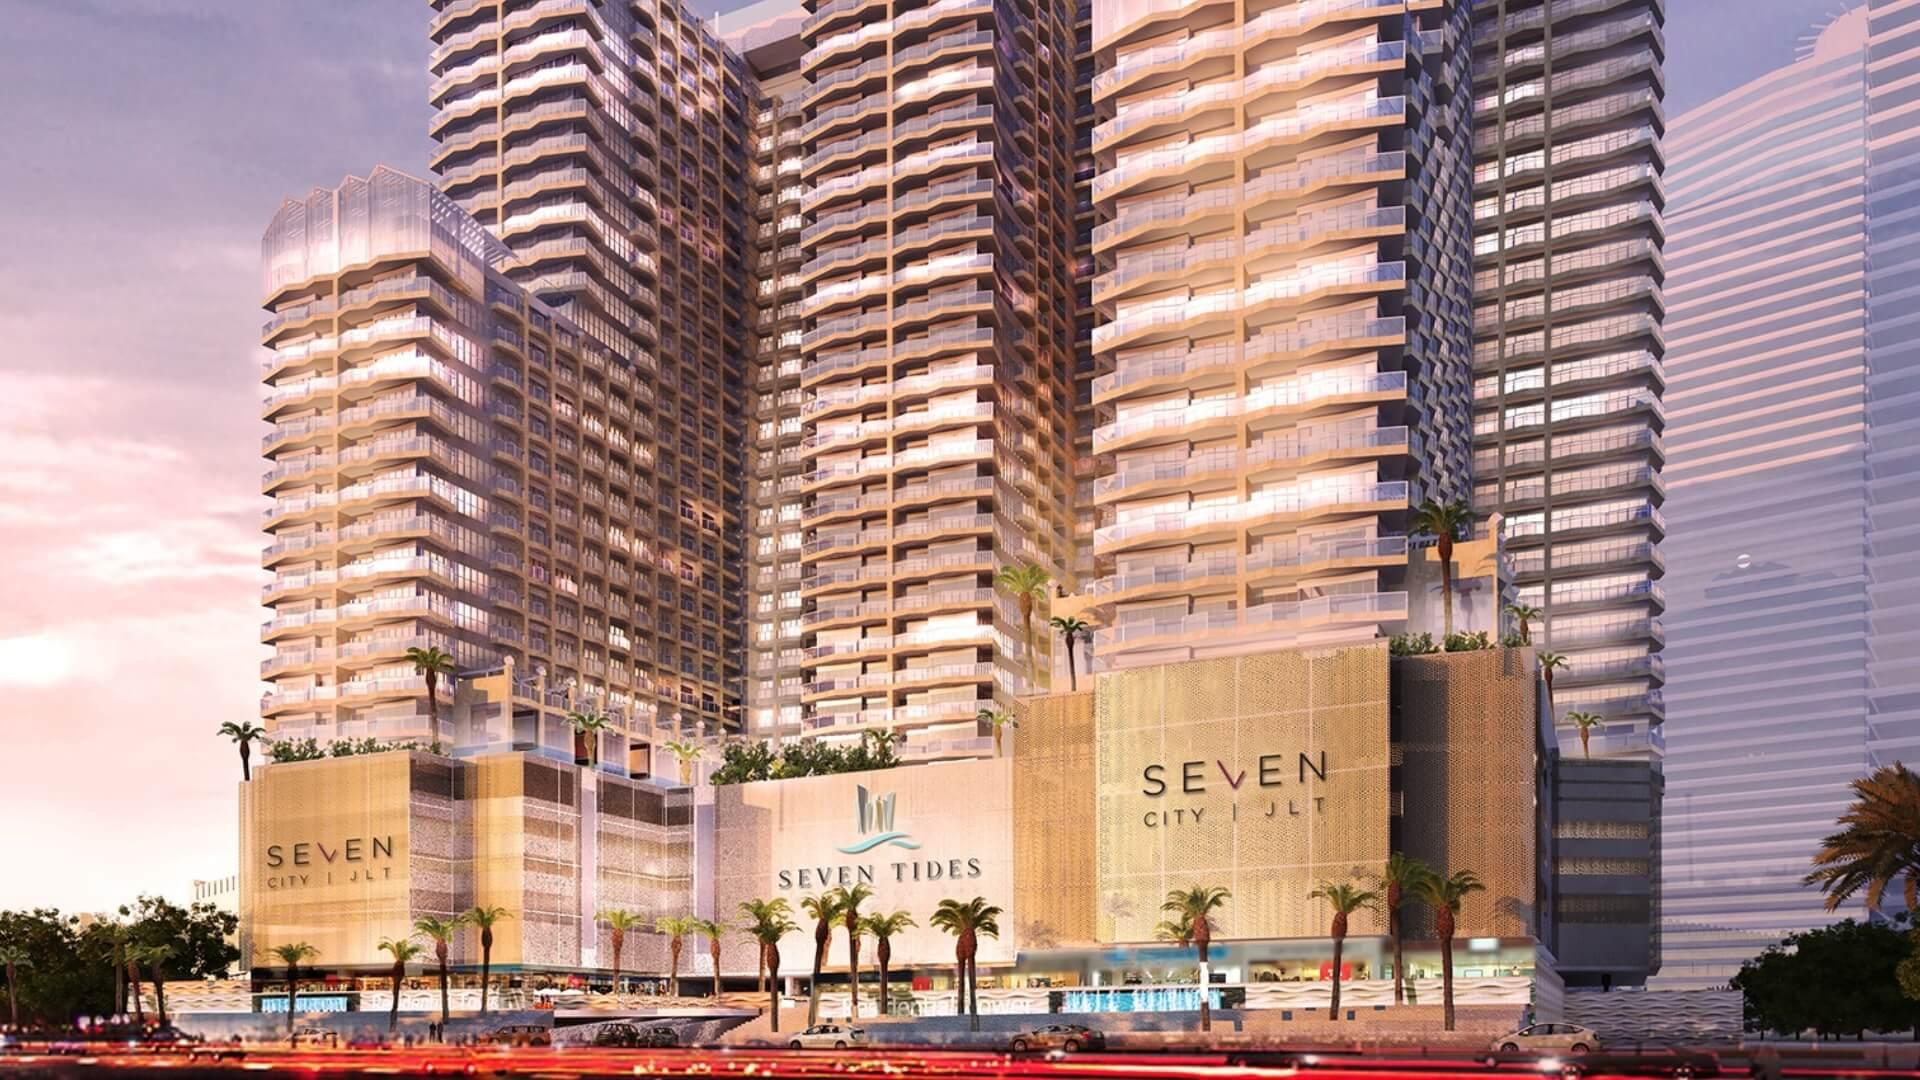 GOLF VIEWS SEVEN CITY, Jumeirah Lake Towers, Dubai, UAE – photo 1